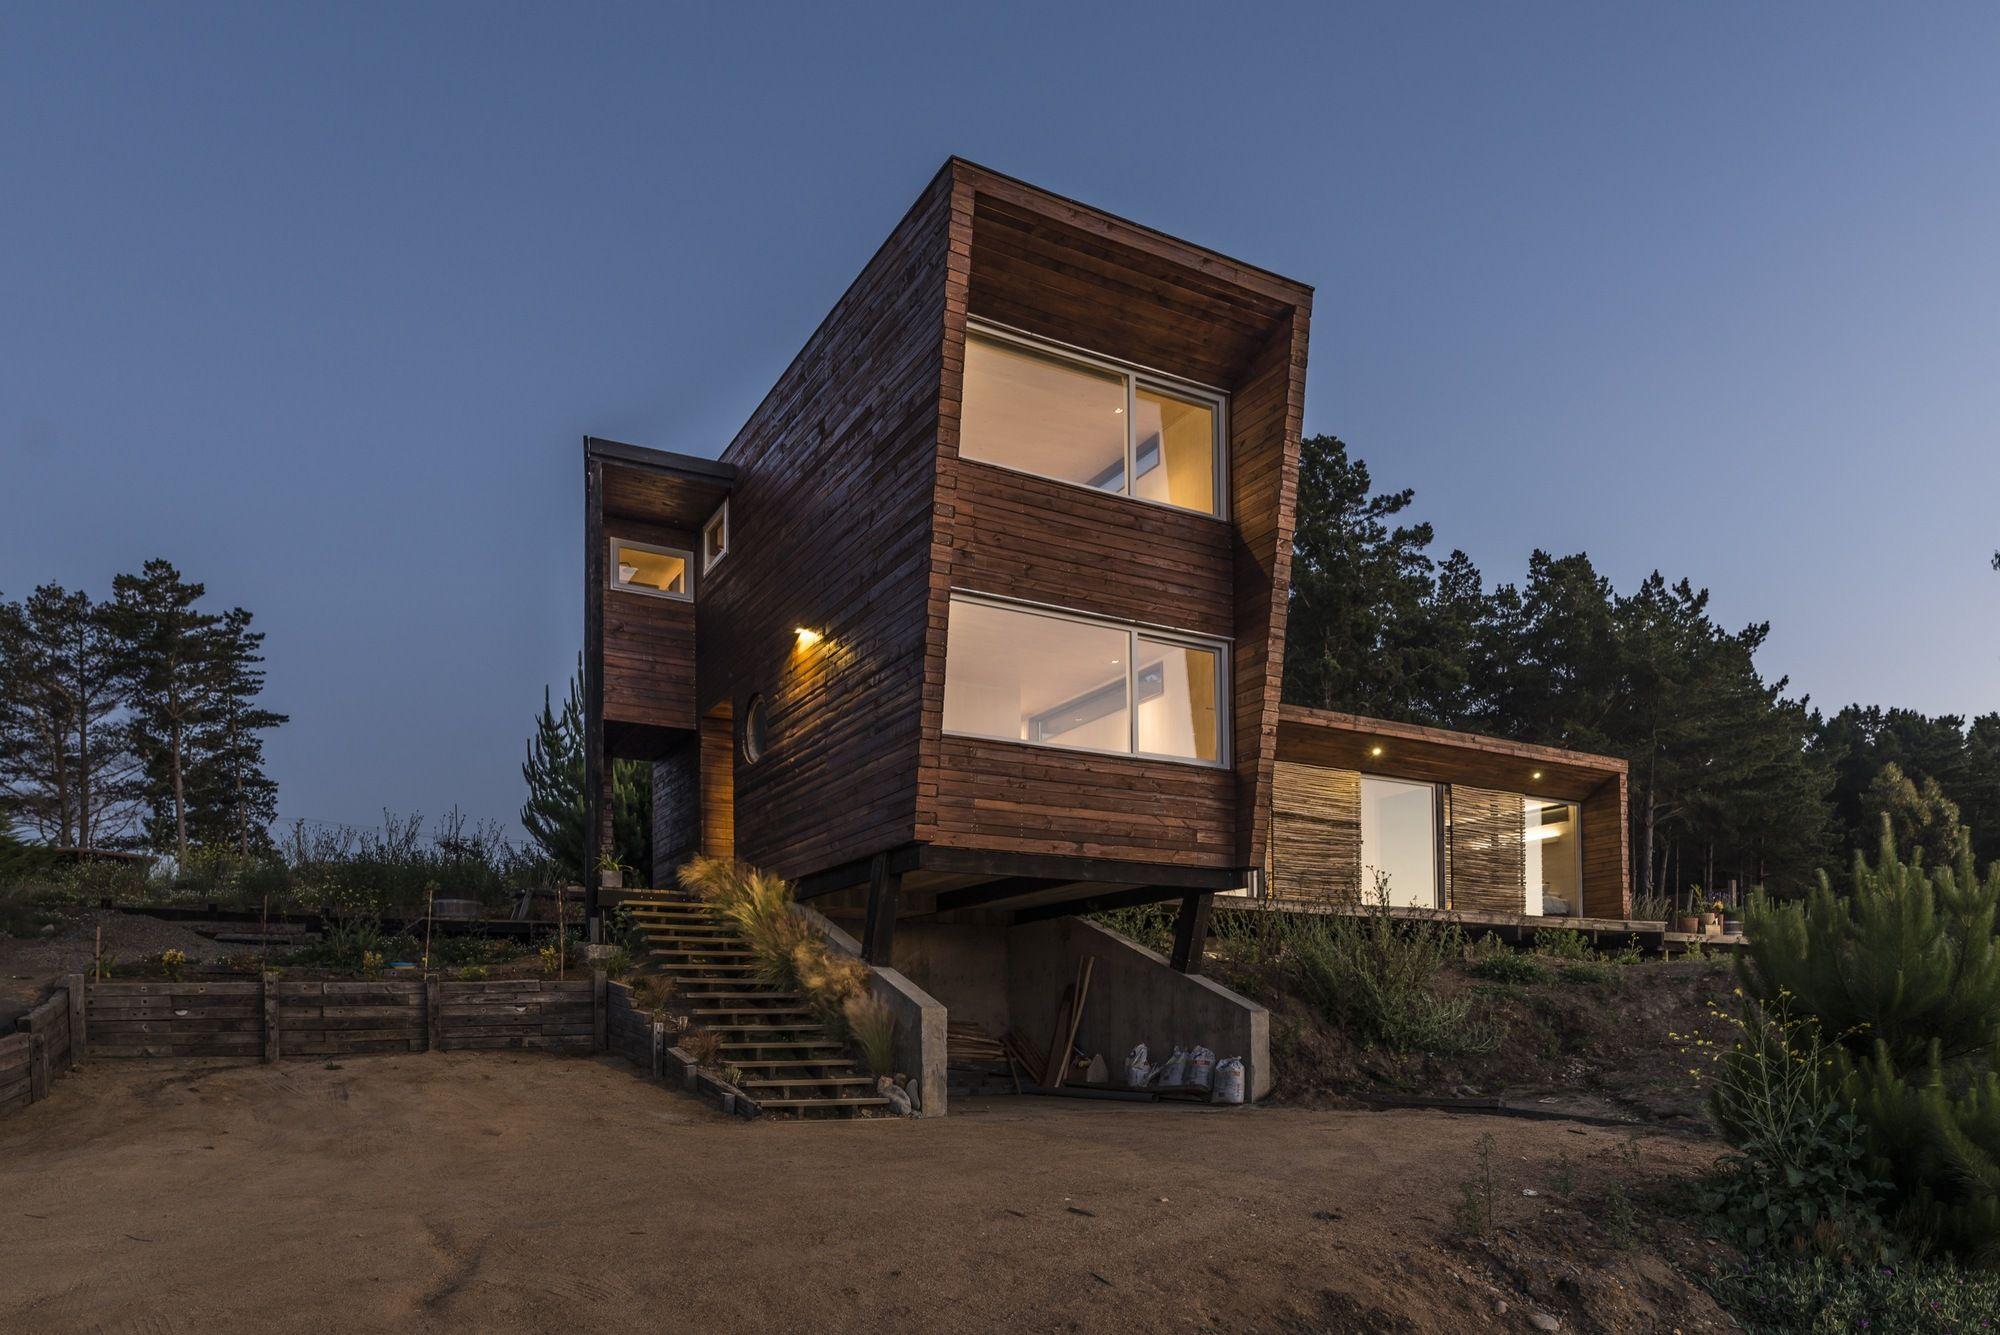 Pin By Richard Grabowski On Iaddic Pinterest House Architecture